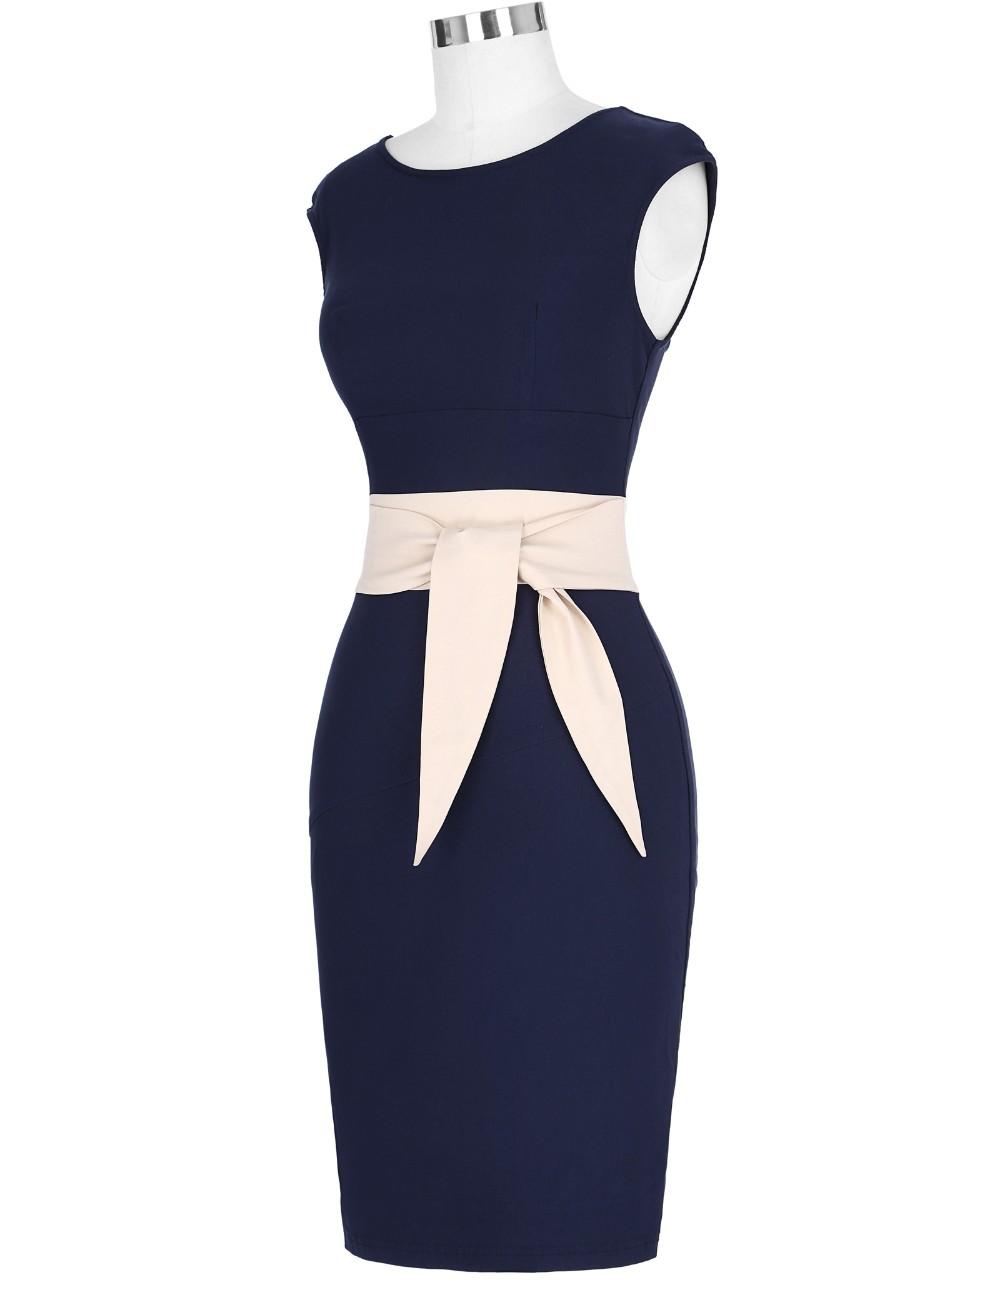 Retro Vintage Sleeveless Crew Neck 2017 Sexy Hollowed Back Cotton Navy Blue Party Dresses Vestidos Casual Office Bodycon Dress 8